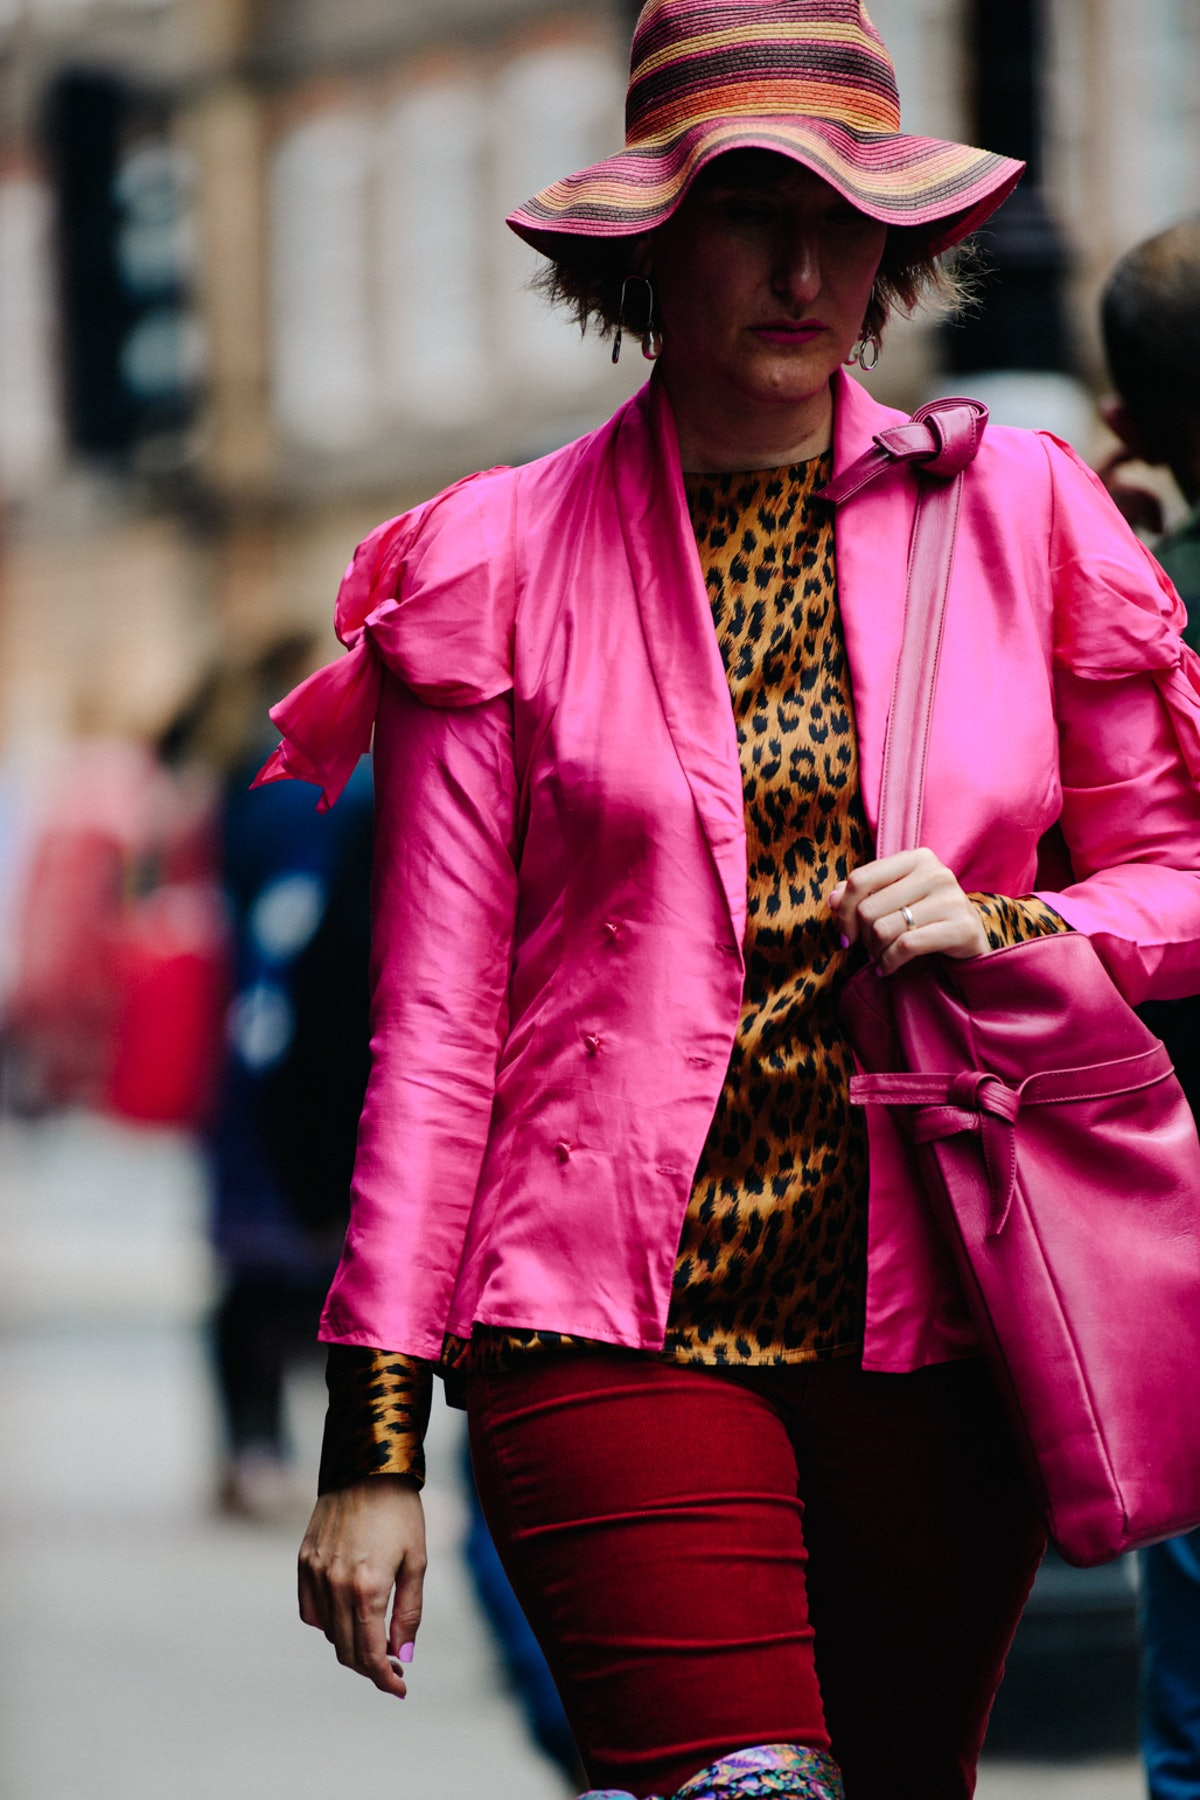 Adam-Katz-Sinding-W-Magazine-London-Fashion-Week-Spring-Summer-2020_AKS0794.jpg